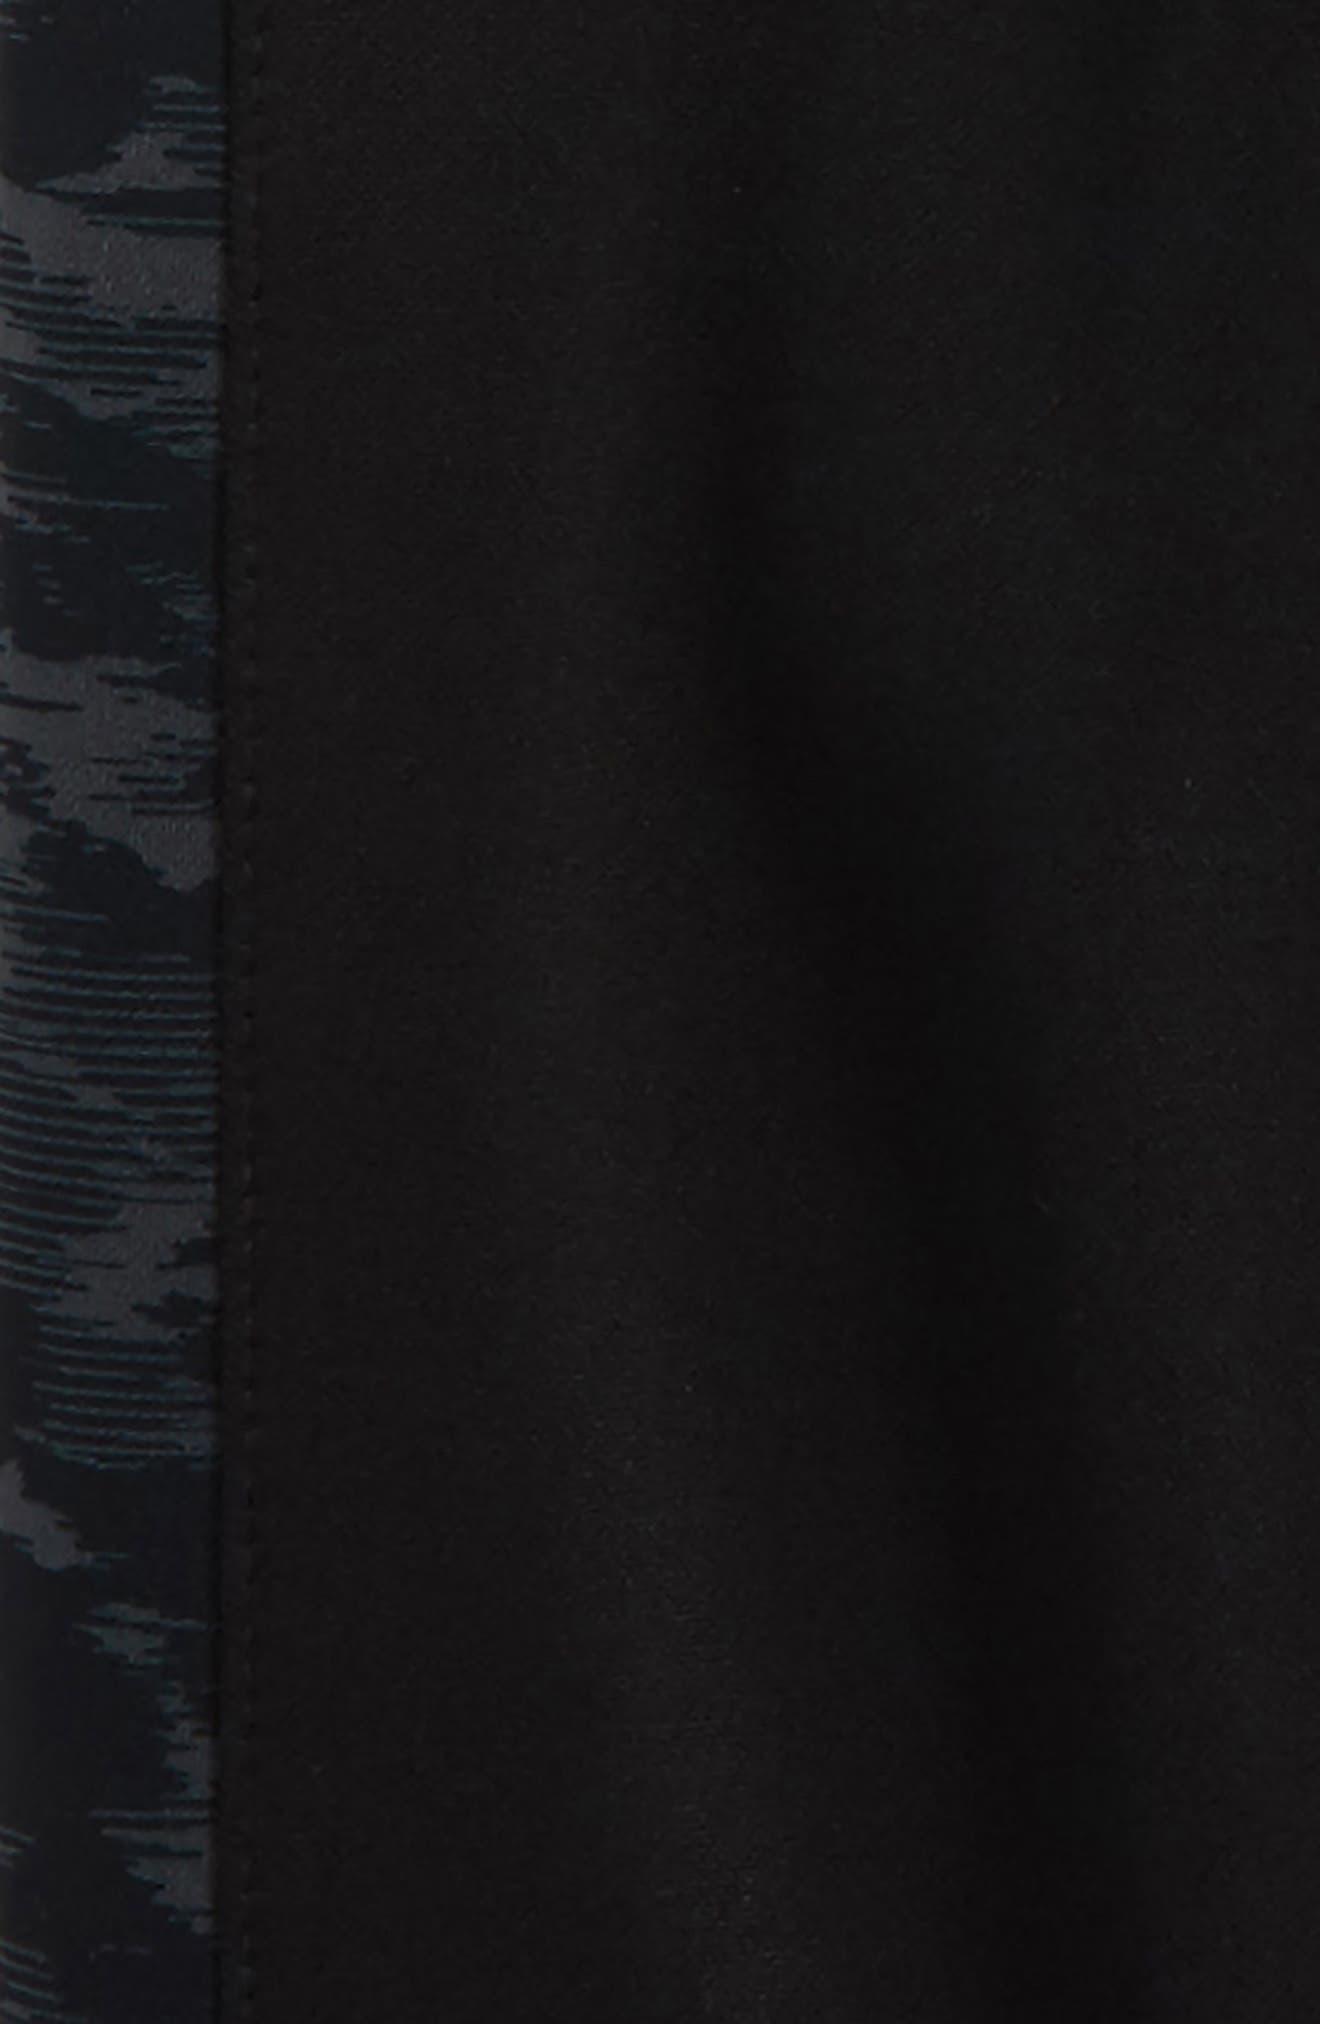 Therma Elite Pants,                             Alternate thumbnail 2, color,                             Black